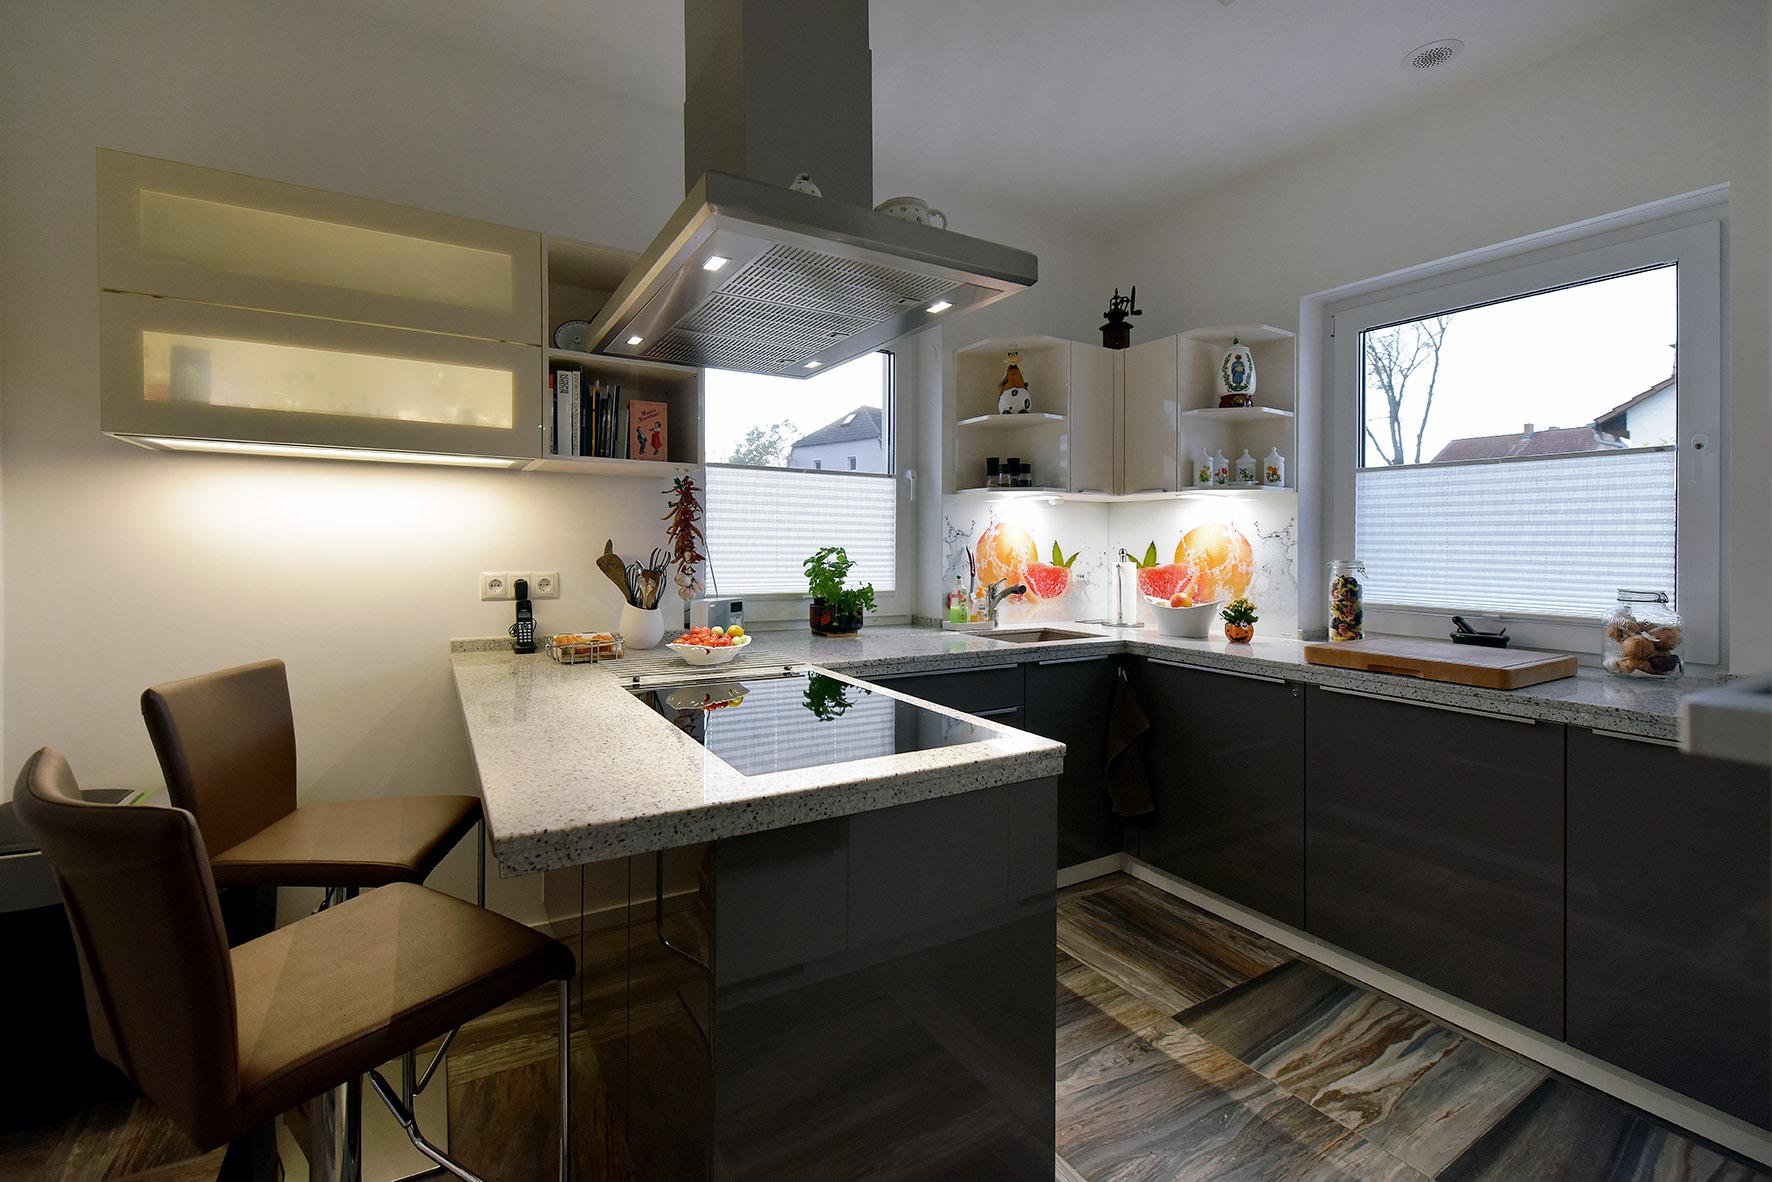 Küche - 2110.jpg